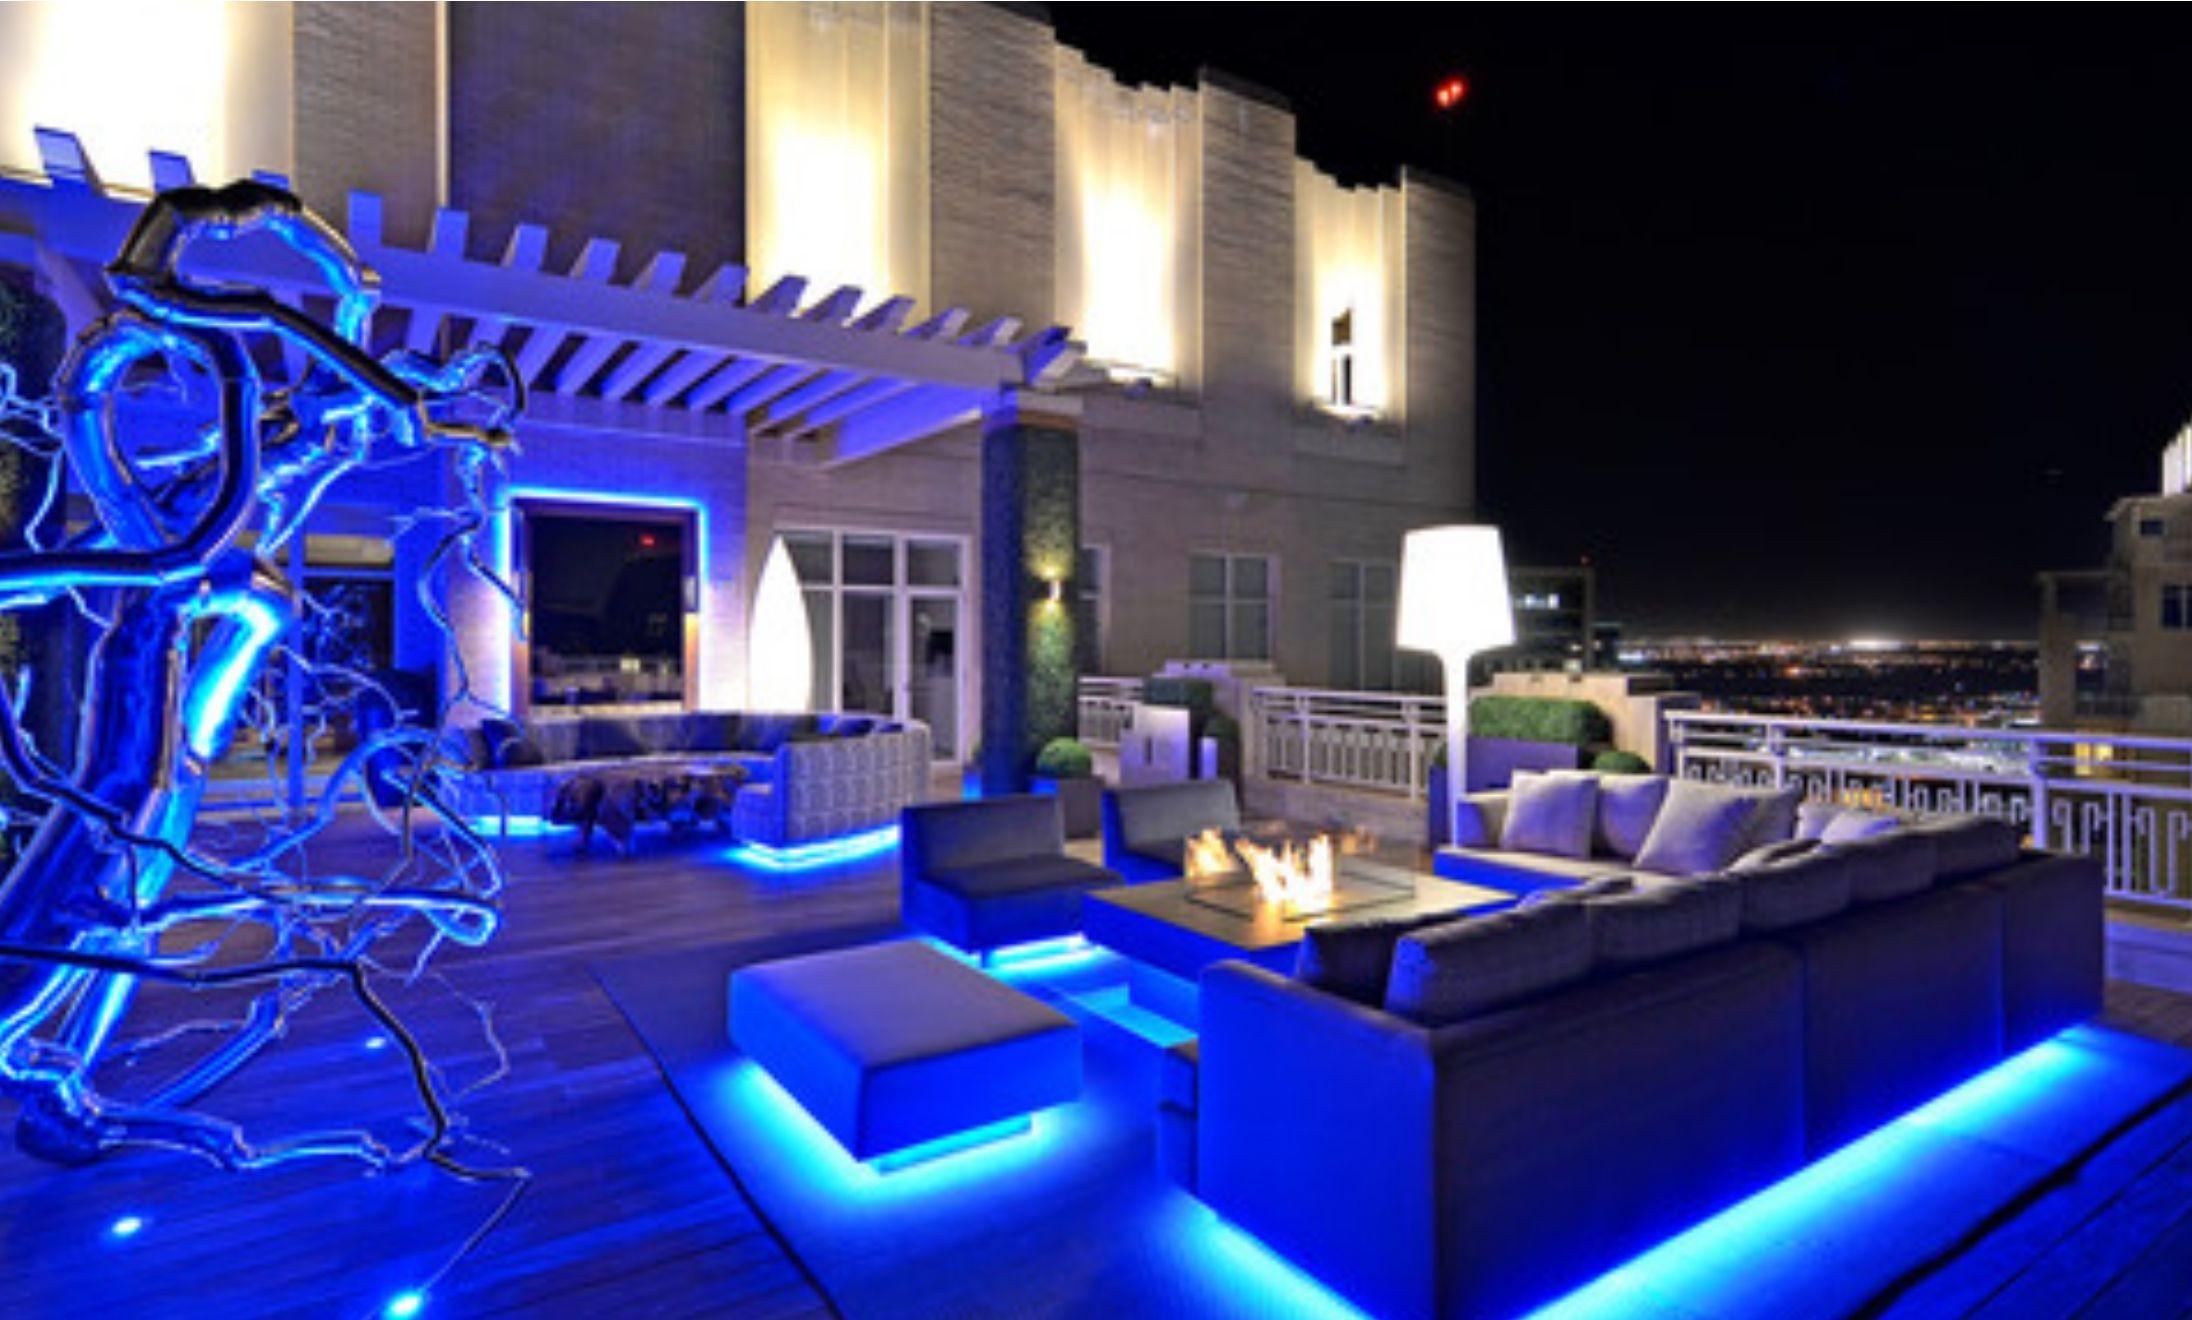 lo amable iluminacion jardines leds en bonito outdoor led lighting diseno para iluminacion jardines leds